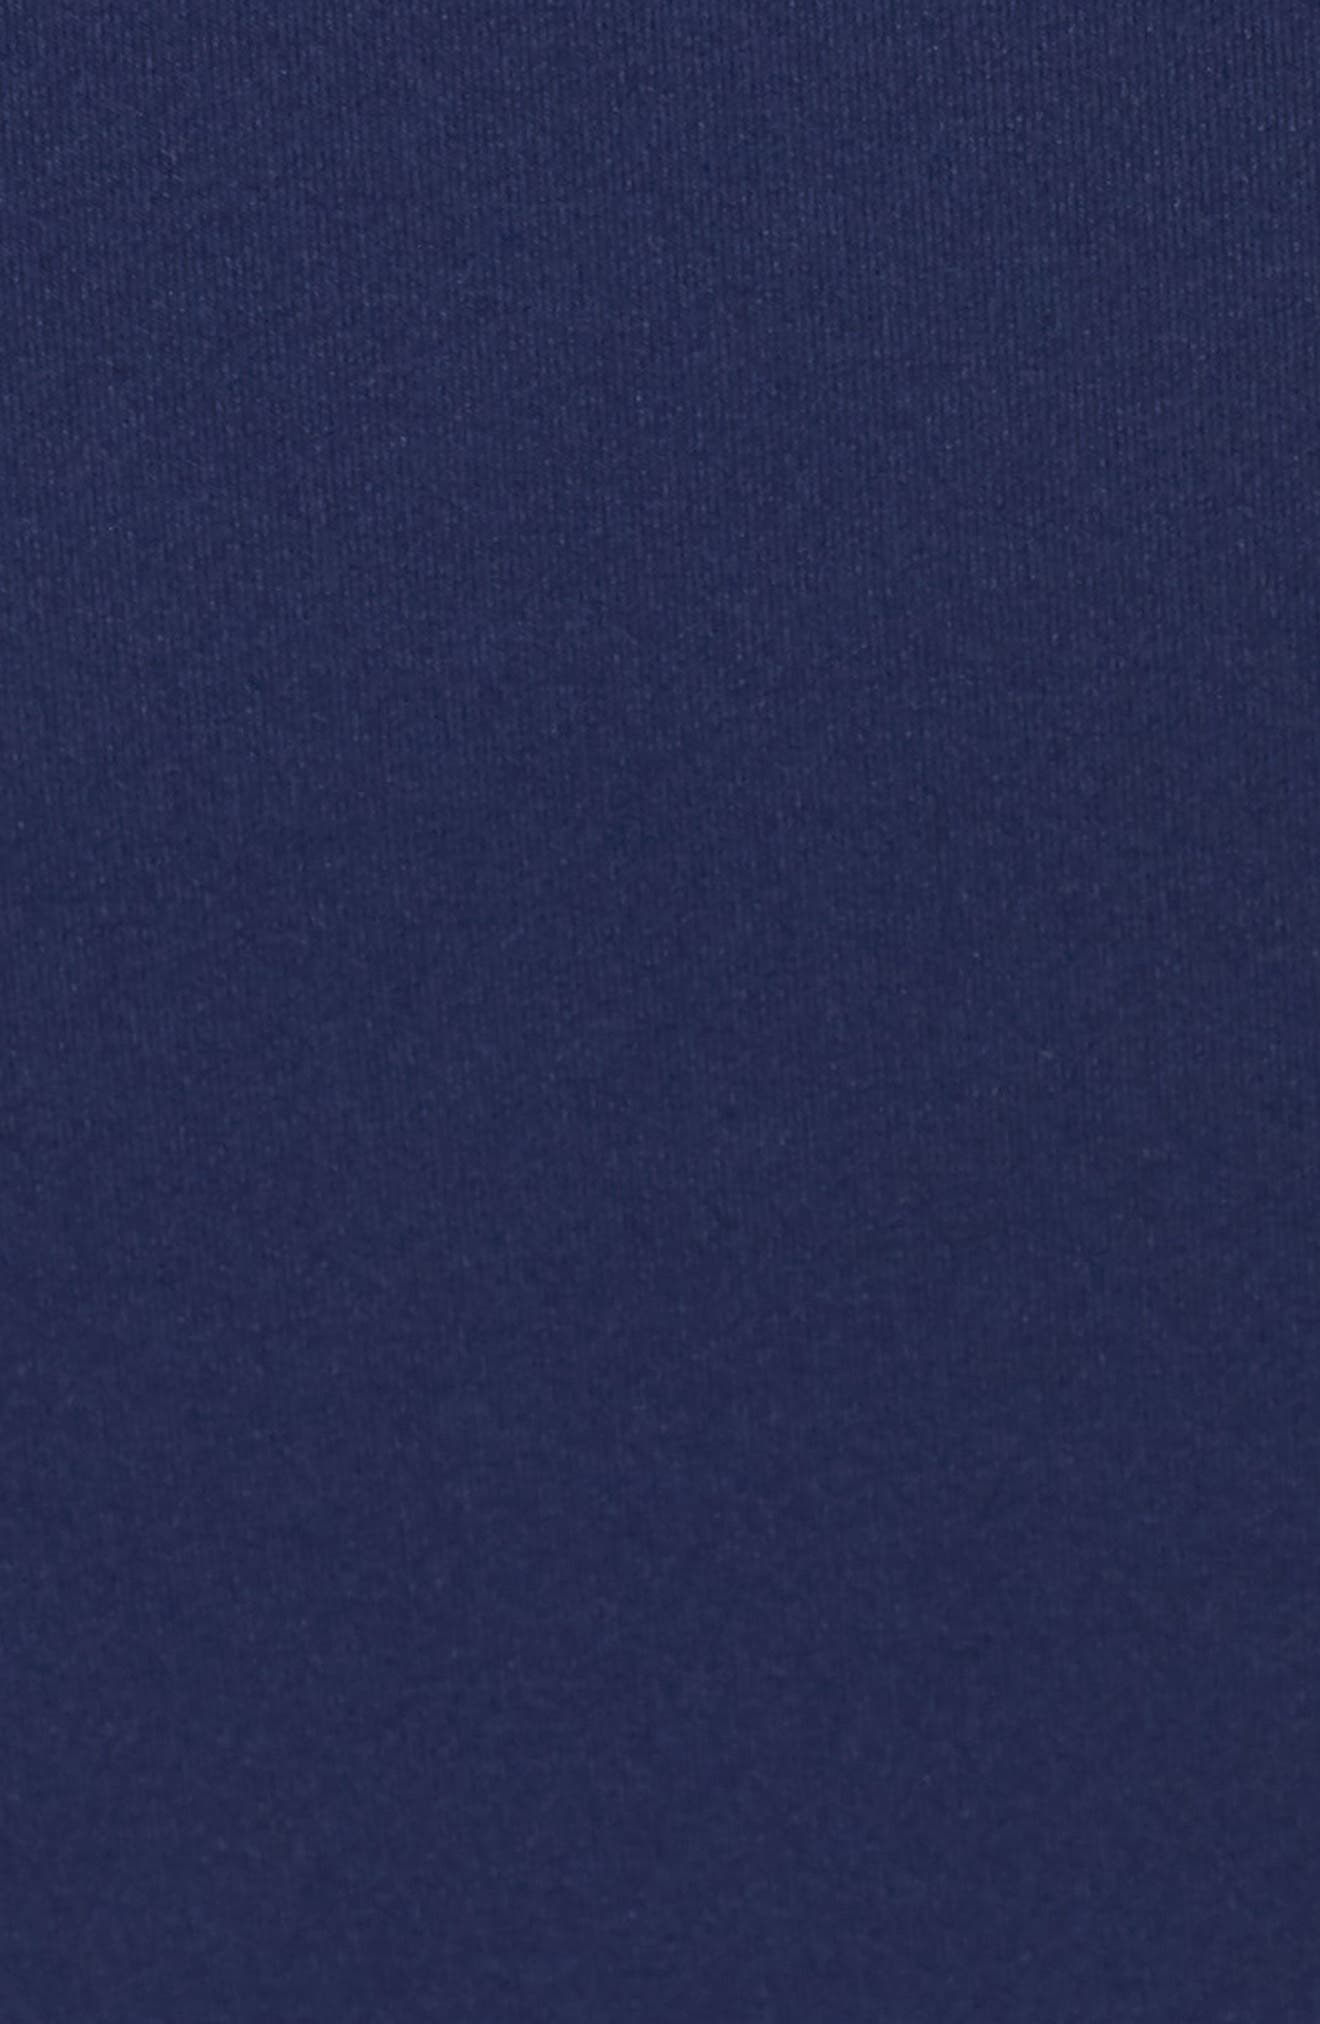 Strapless Tie Front Sheath Dress,                             Alternate thumbnail 6, color,